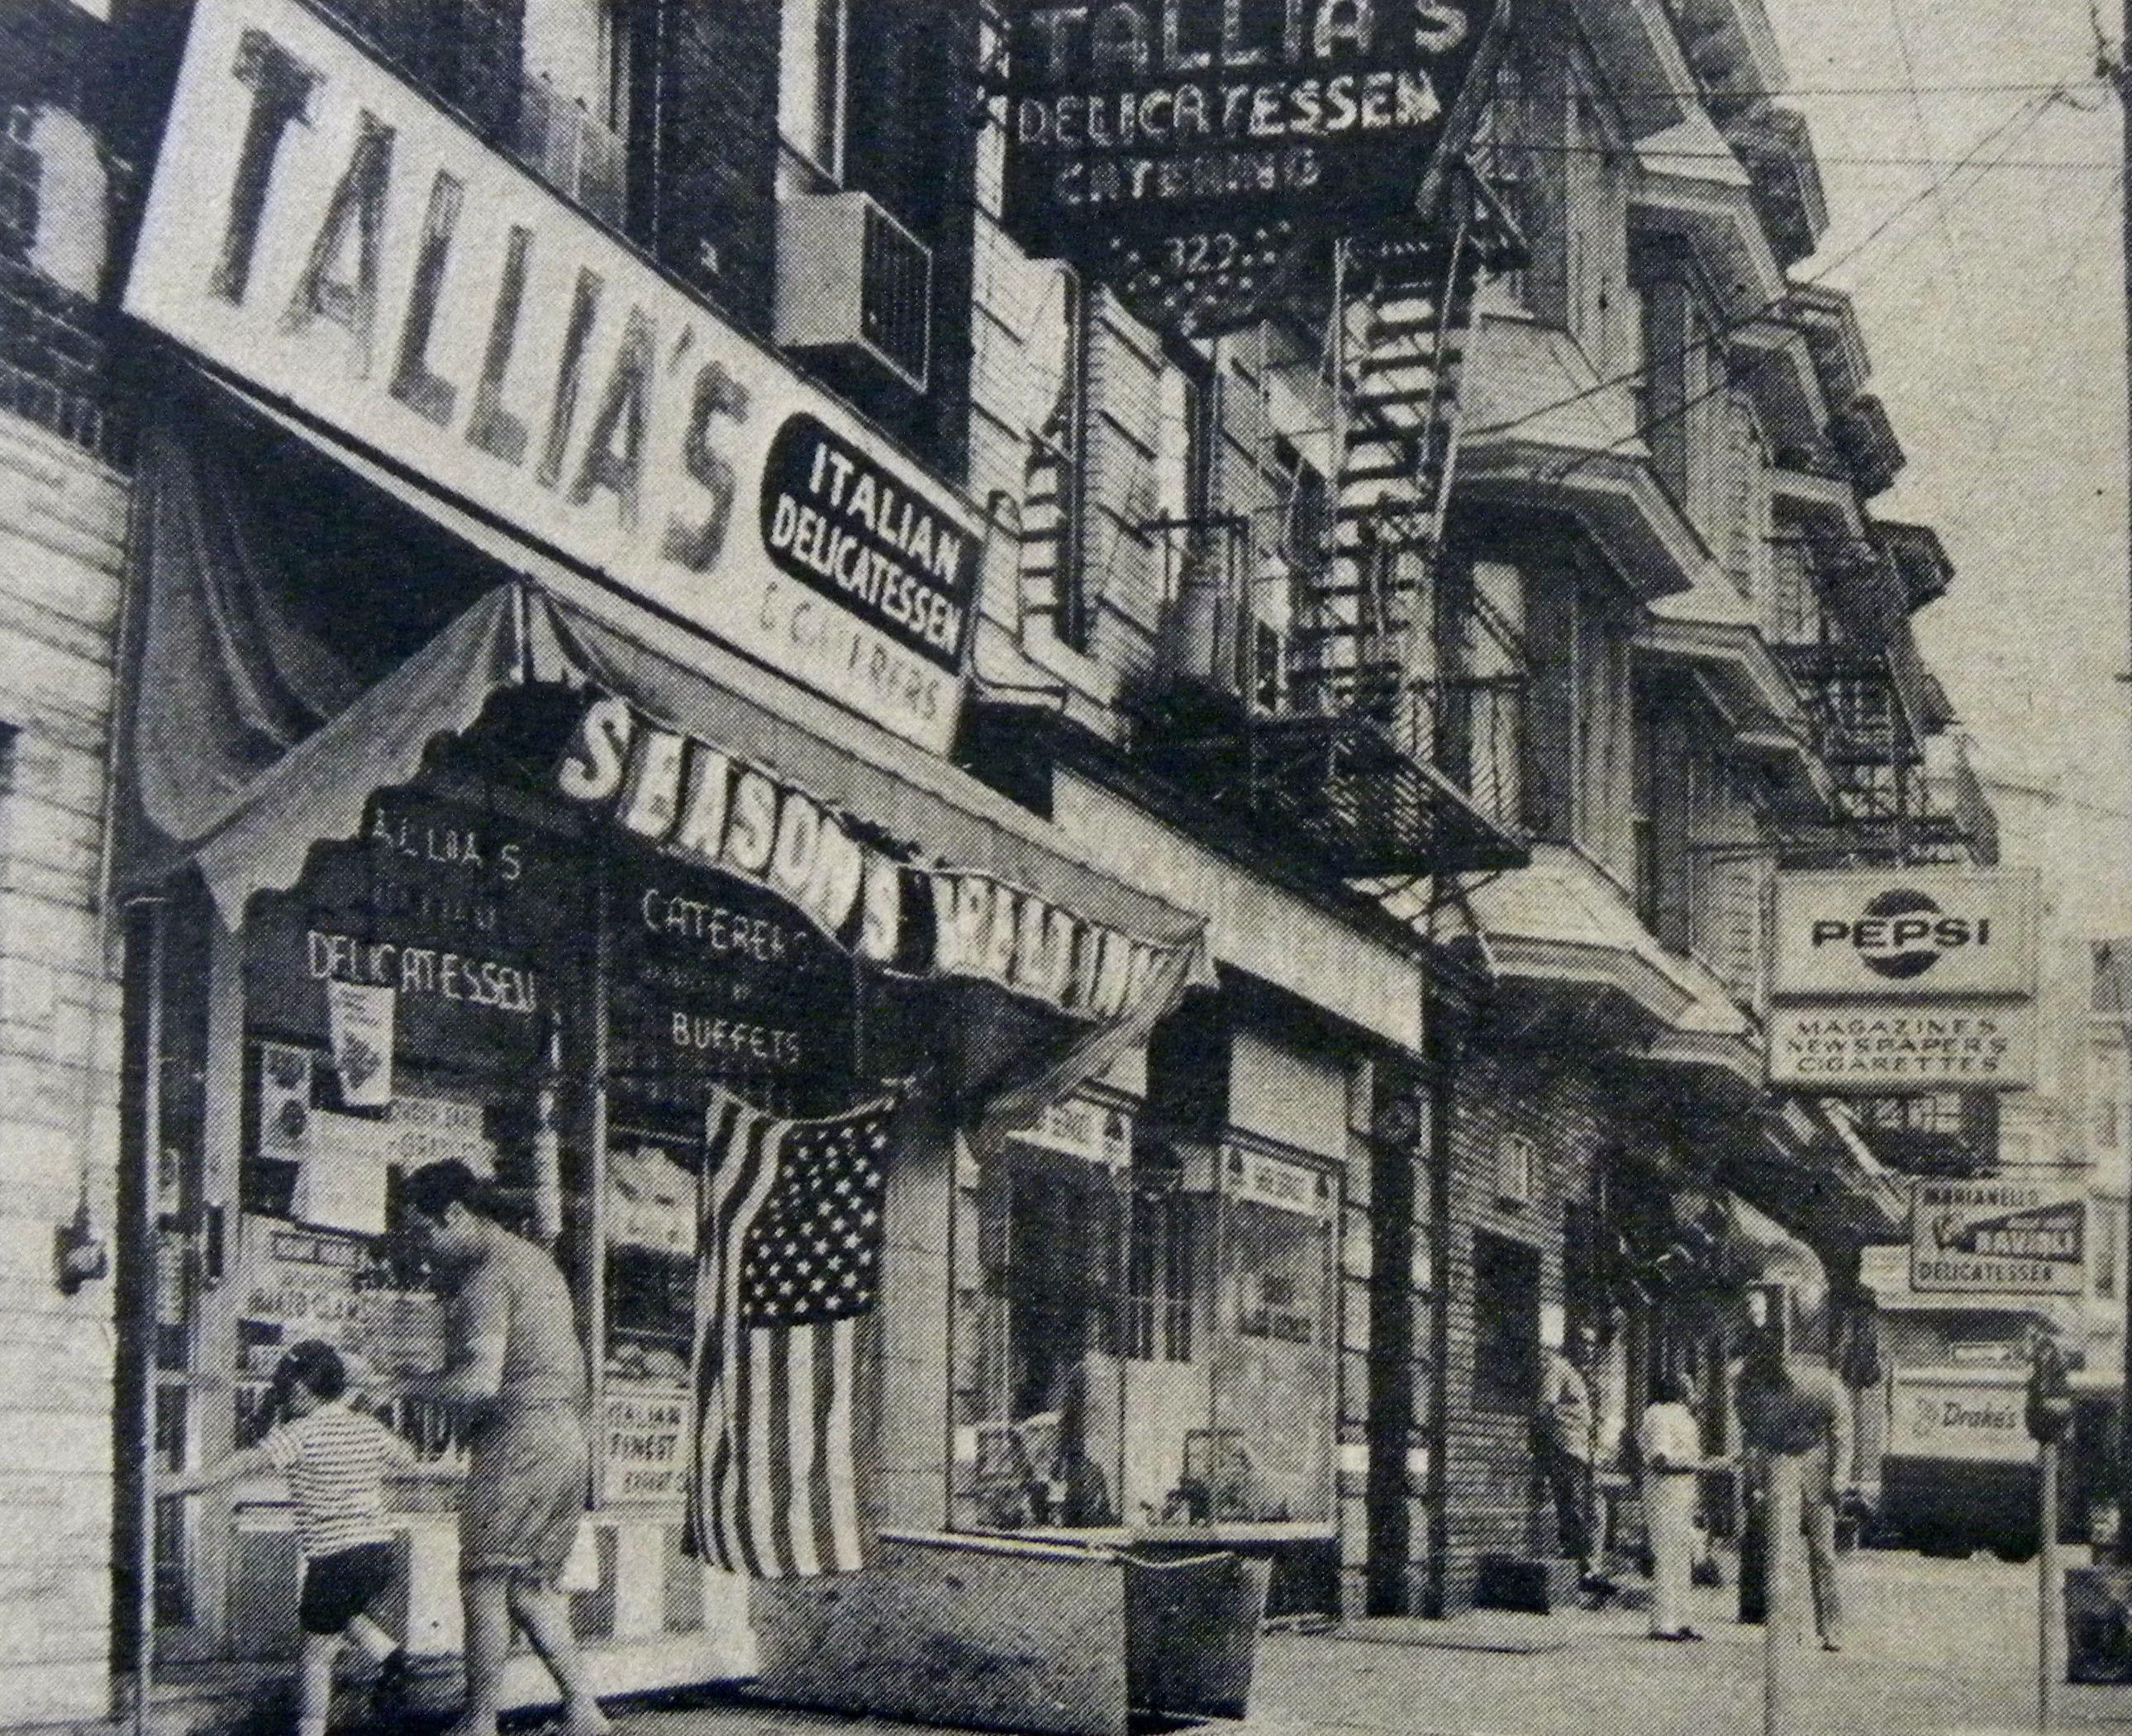 21st Ave in Paterson NJ 1970's Paterson, Tallia, Jersey girl